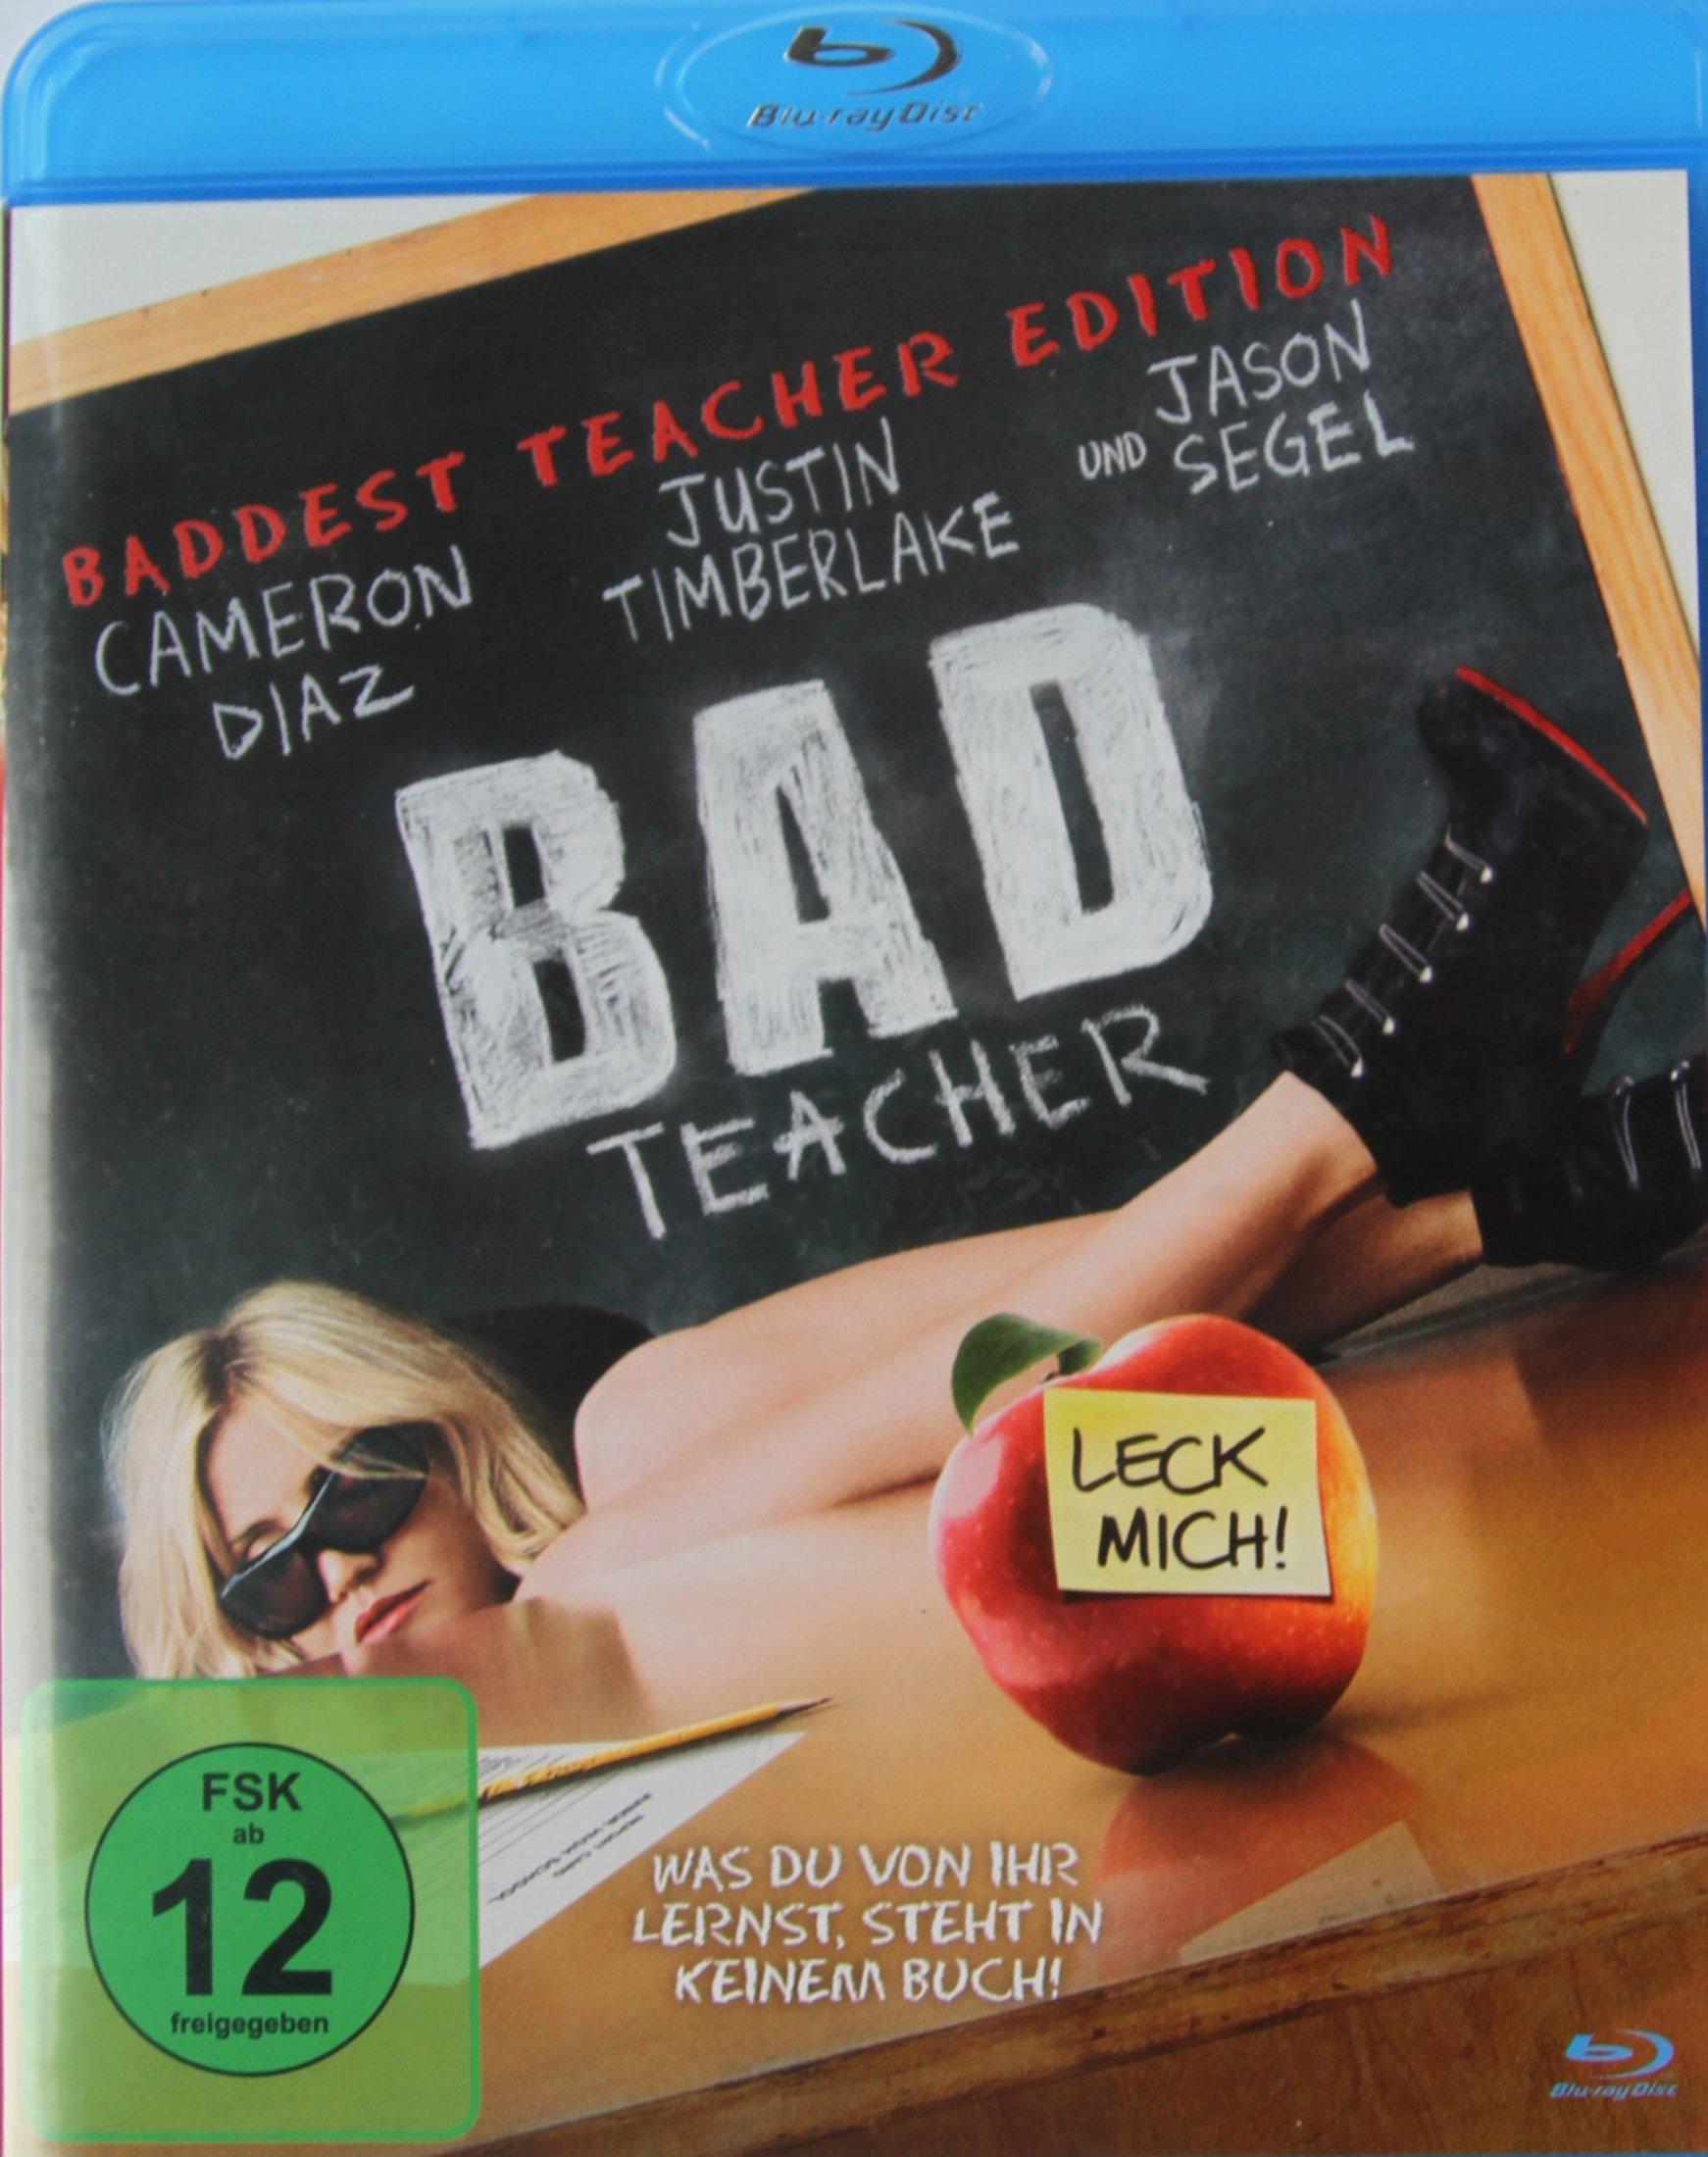 Bad teacher Front